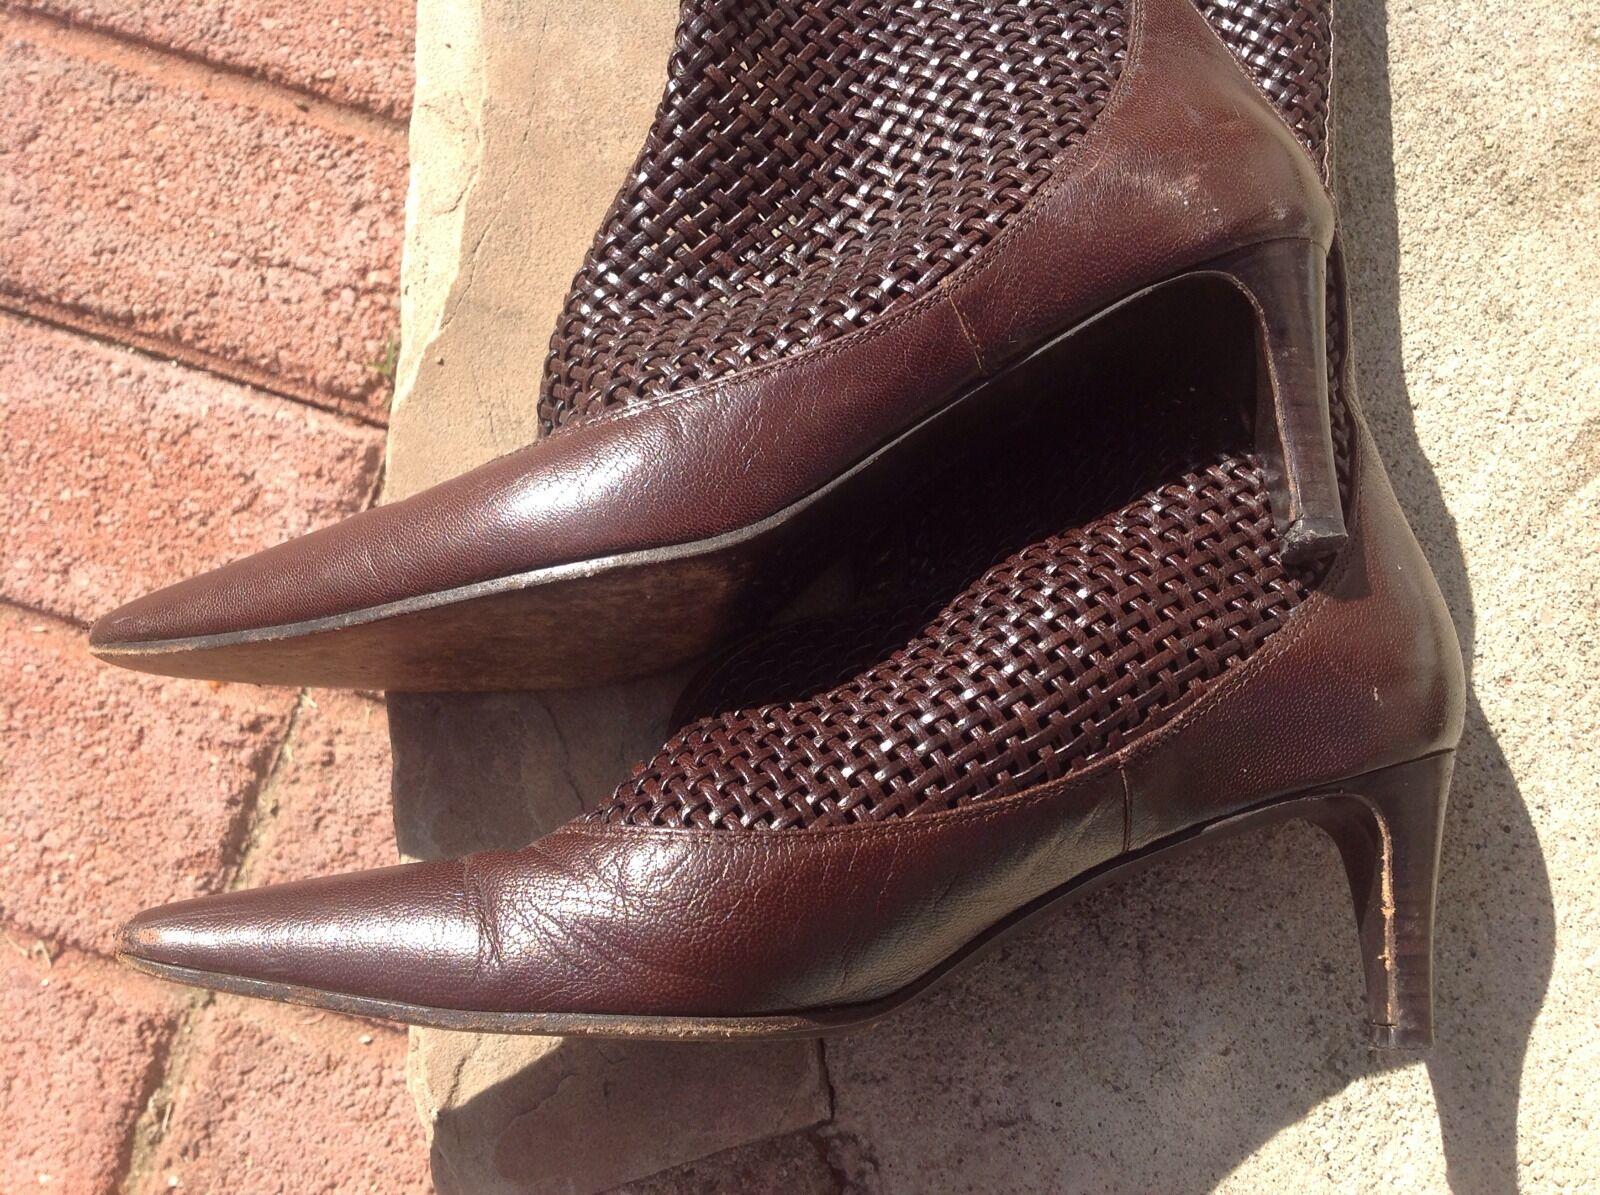 BOTTEGA VENETA Knee High Boots Boots Boots Brown Weaved Leather Sz 36.5 US 6.5 Pre Owned 8ebd3e